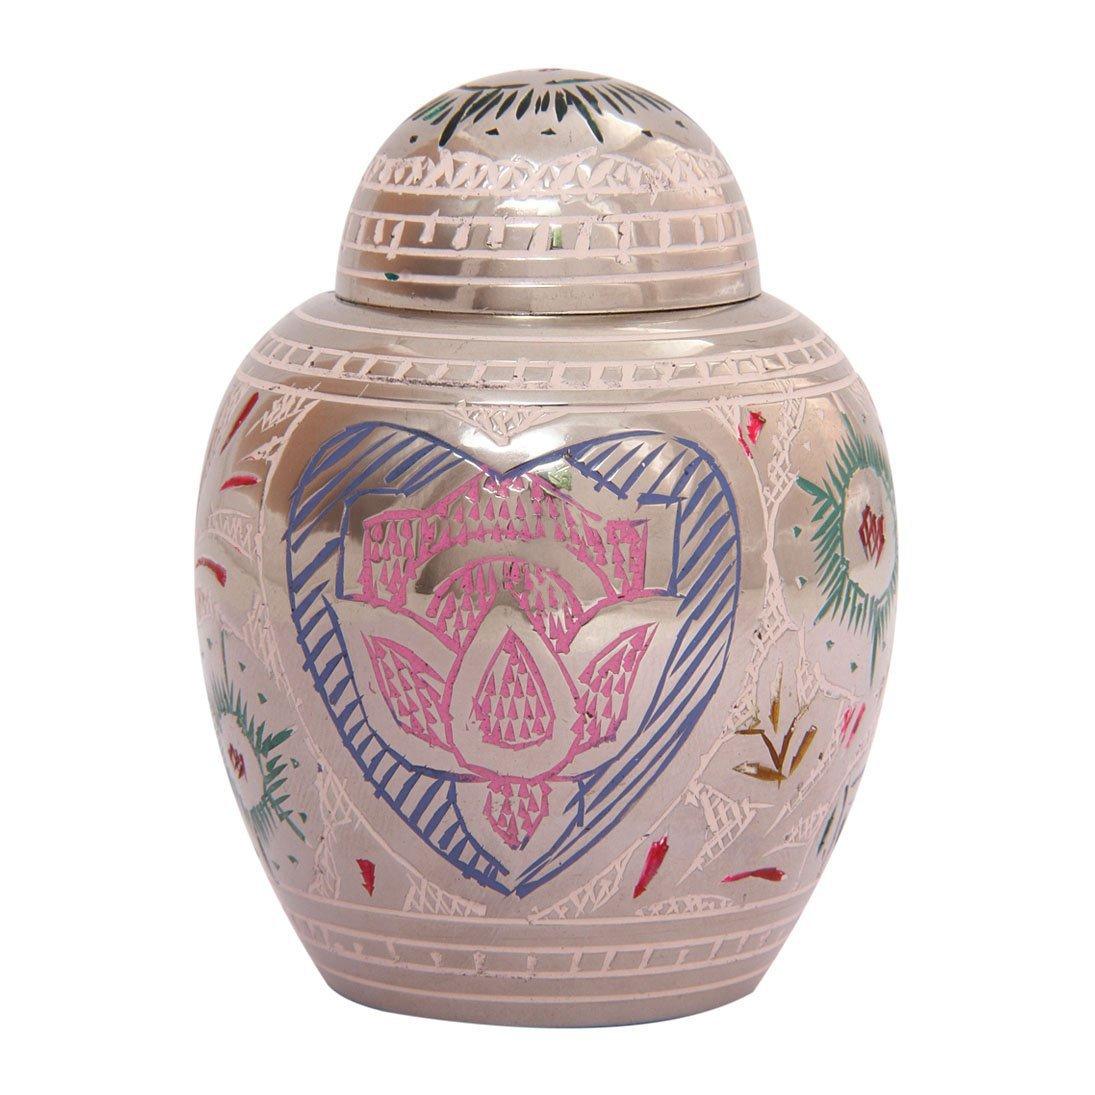 Unique Lotus Heart Mini Cremation Keepsake Urn Ashes, Memorial Keepsake Urns